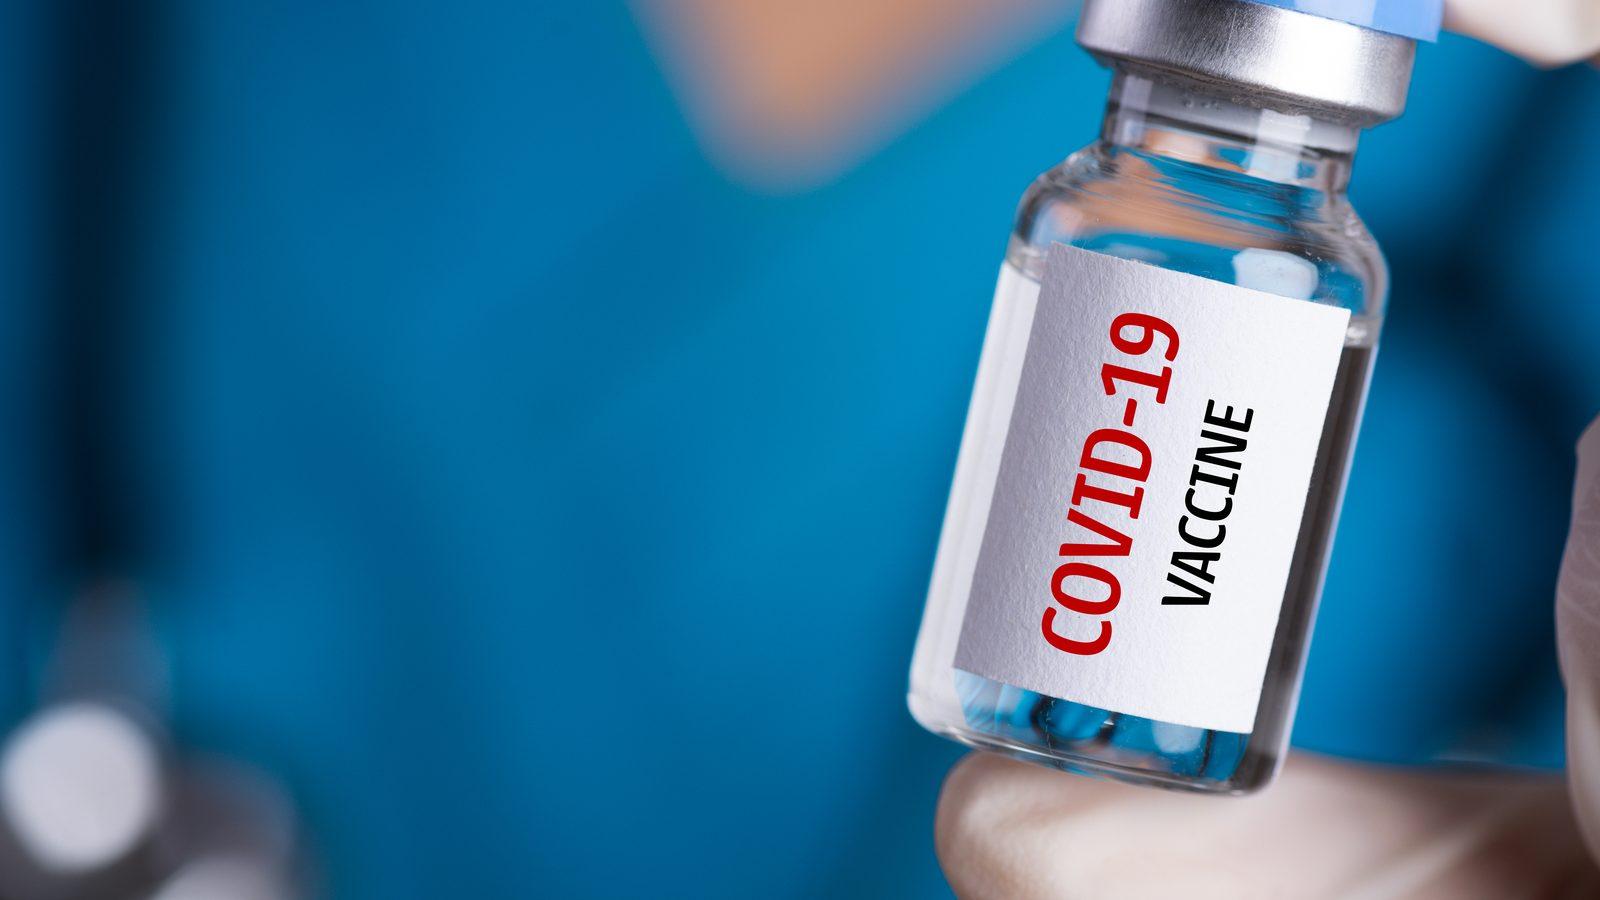 over6698croredosesofcovidvaccineadministeredsofaracrosscountry